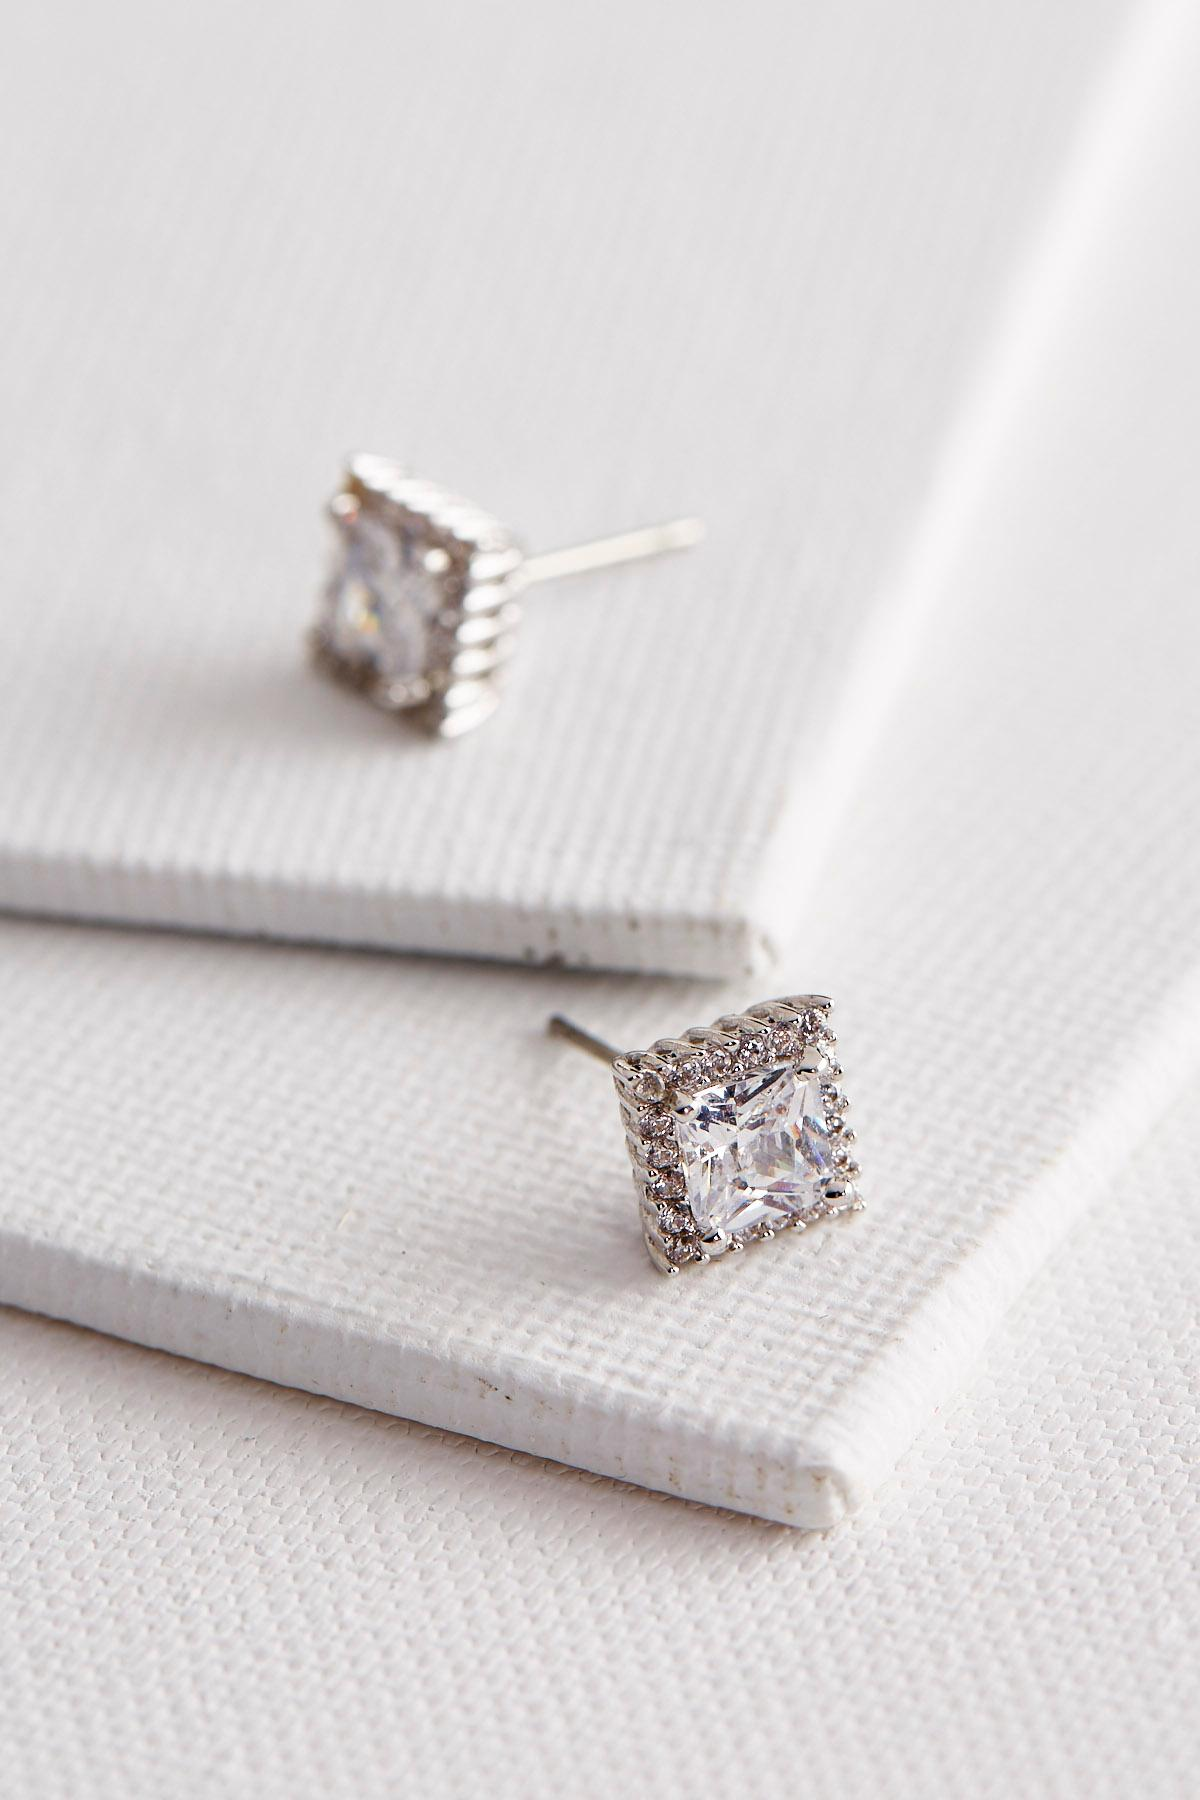 Haloed Brass Cz Princess Cut Stud Earrings